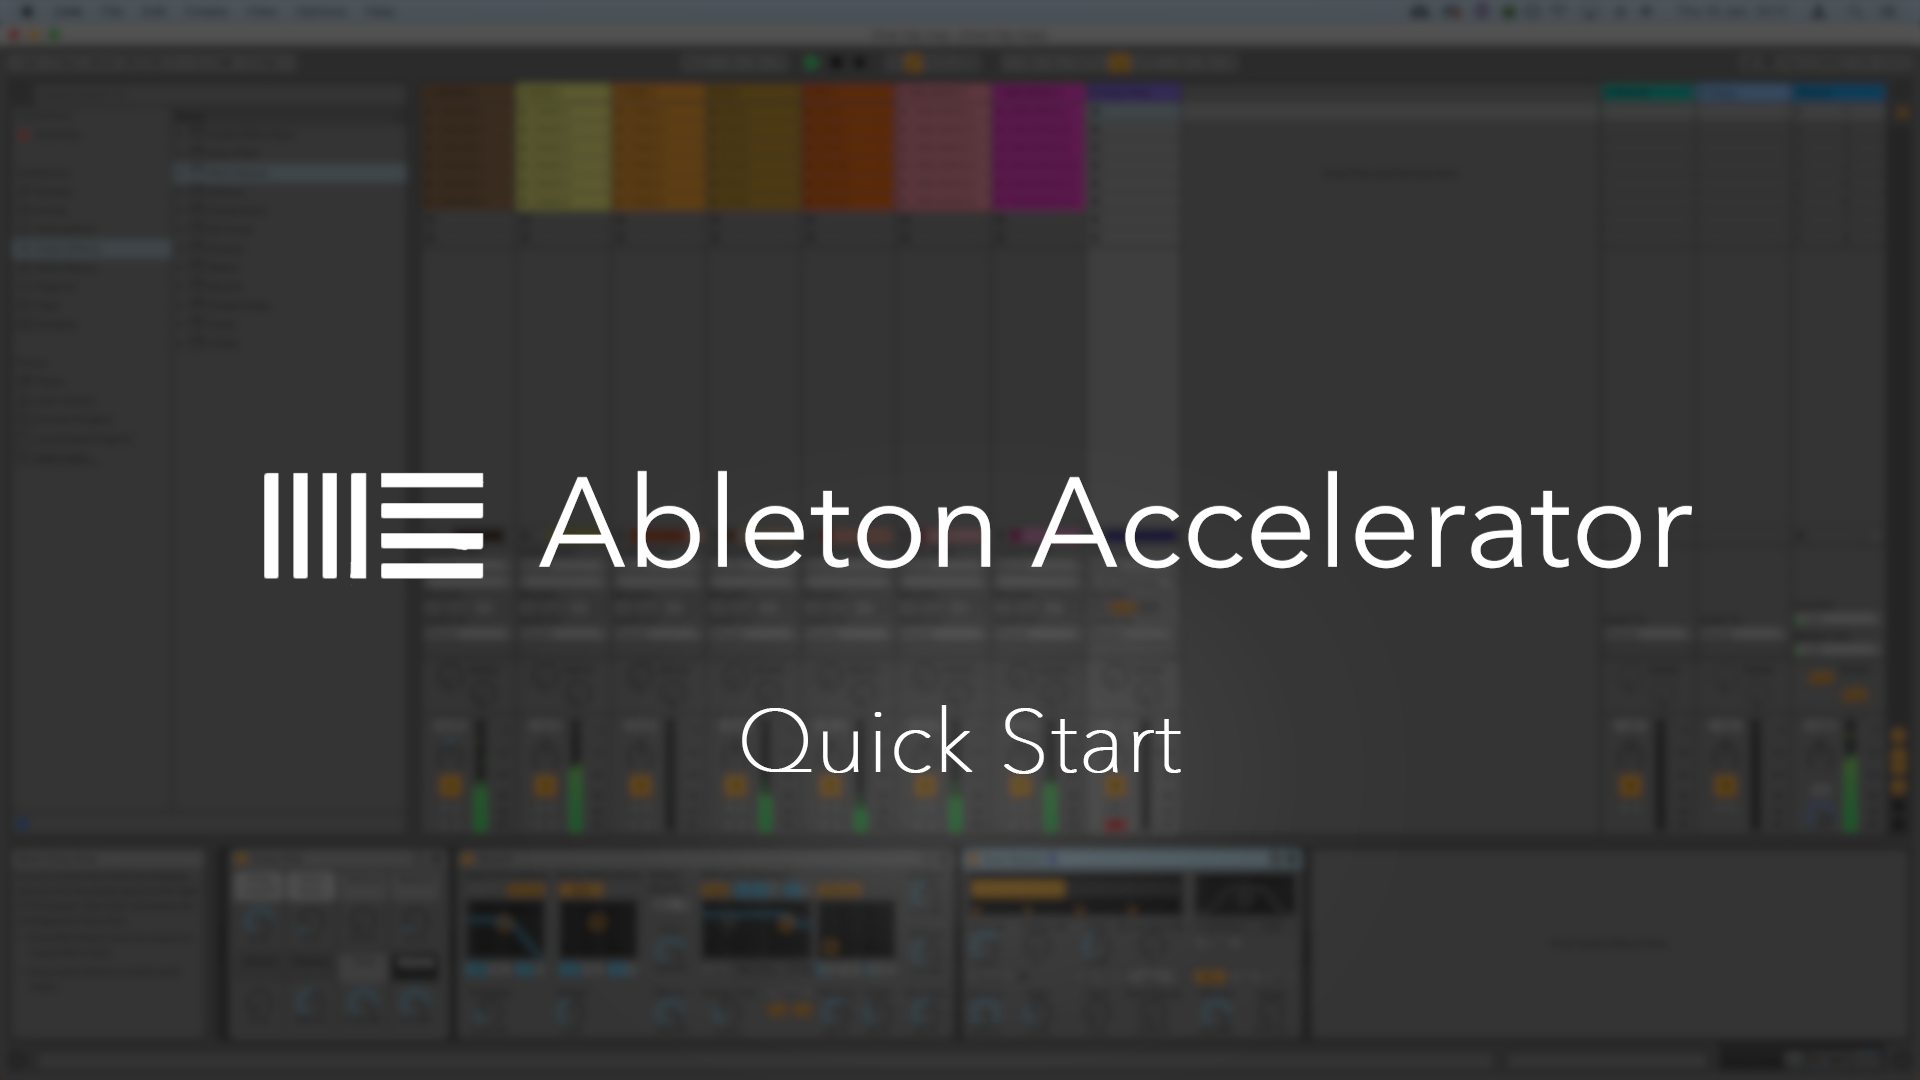 Ableton Accelerator Quick Start